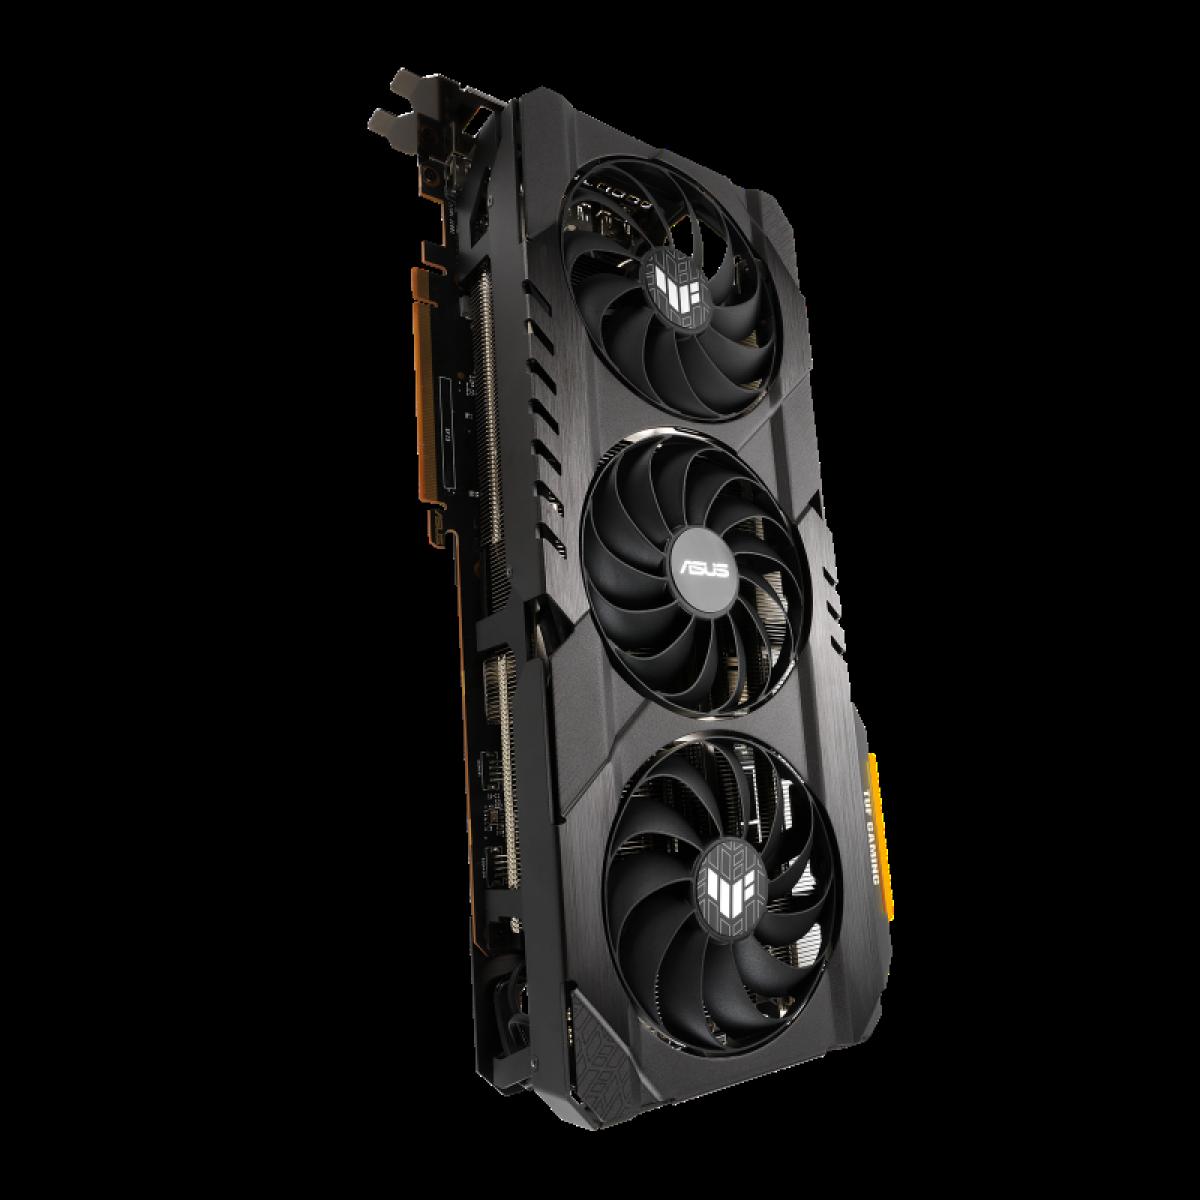 Placa de Vídeo Asus TUF Gaming Radeon RX 6800 XT, 16GB, GDDR6, 256bit, TUF-RX6800XT-O16G-GAMING